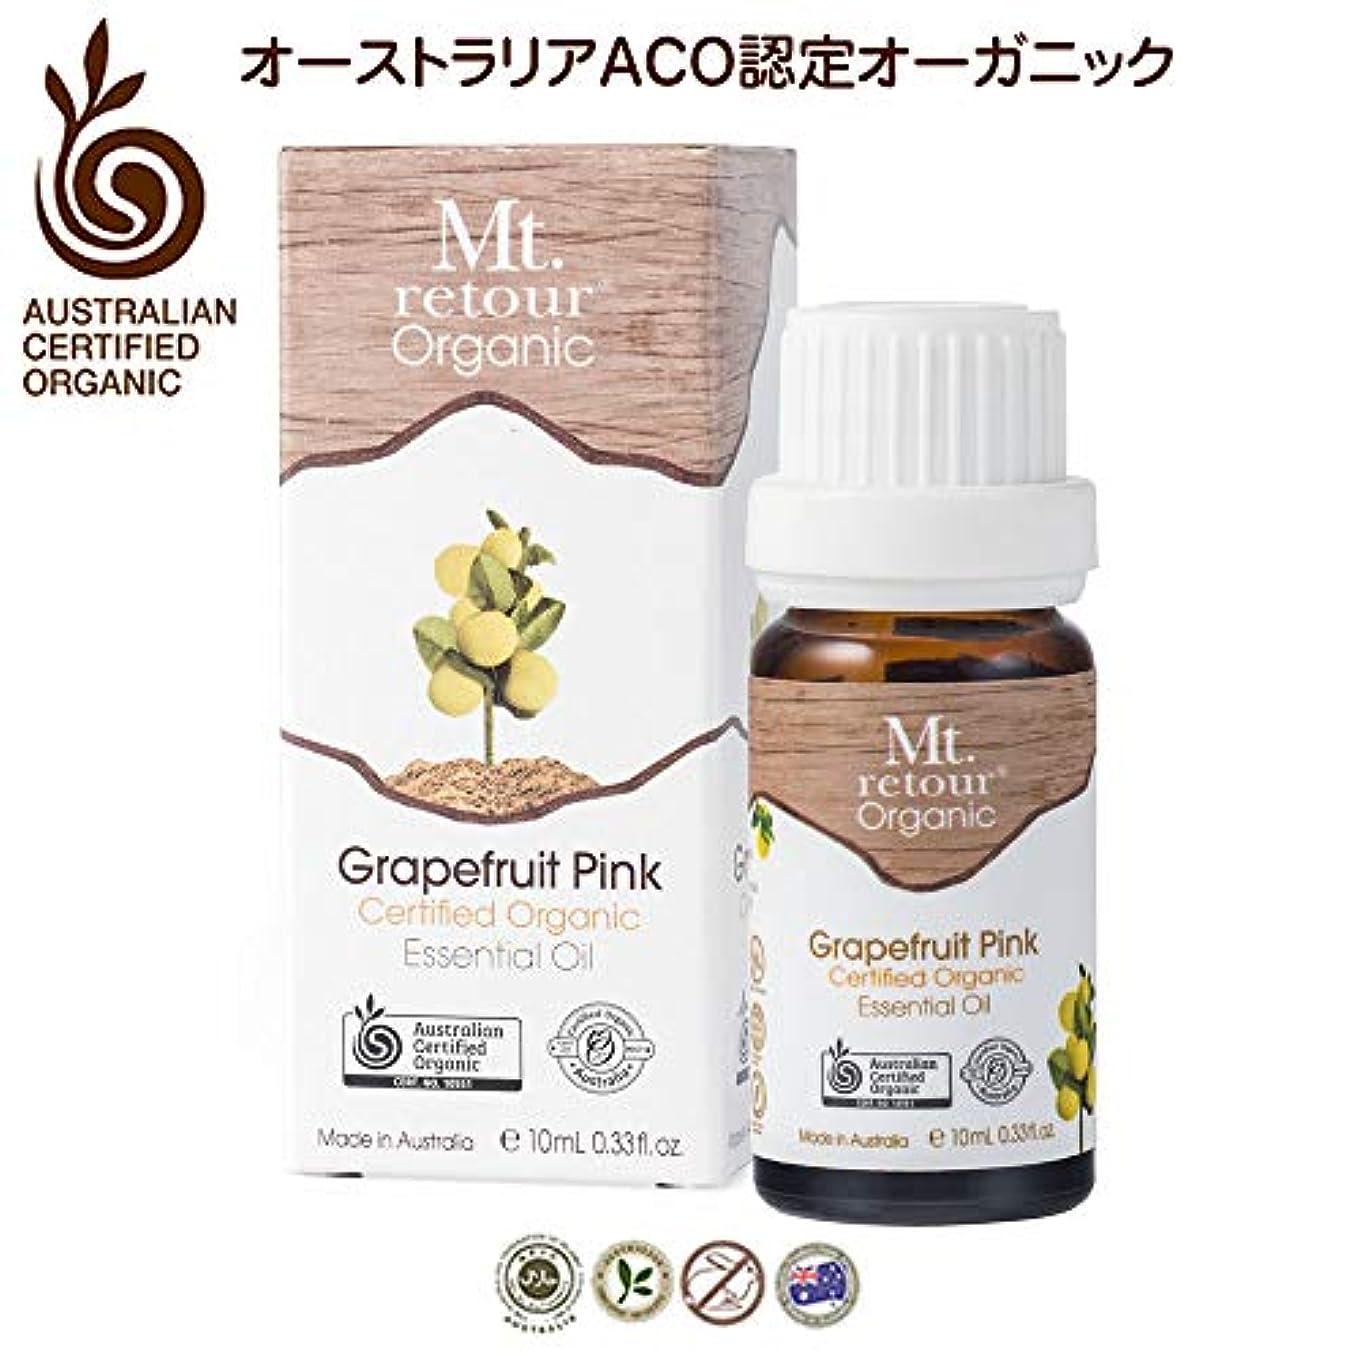 Mt. retour ACO認定オーガニック グレープフルーツピンク 10ml エッセンシャルオイル(有機)アロマ